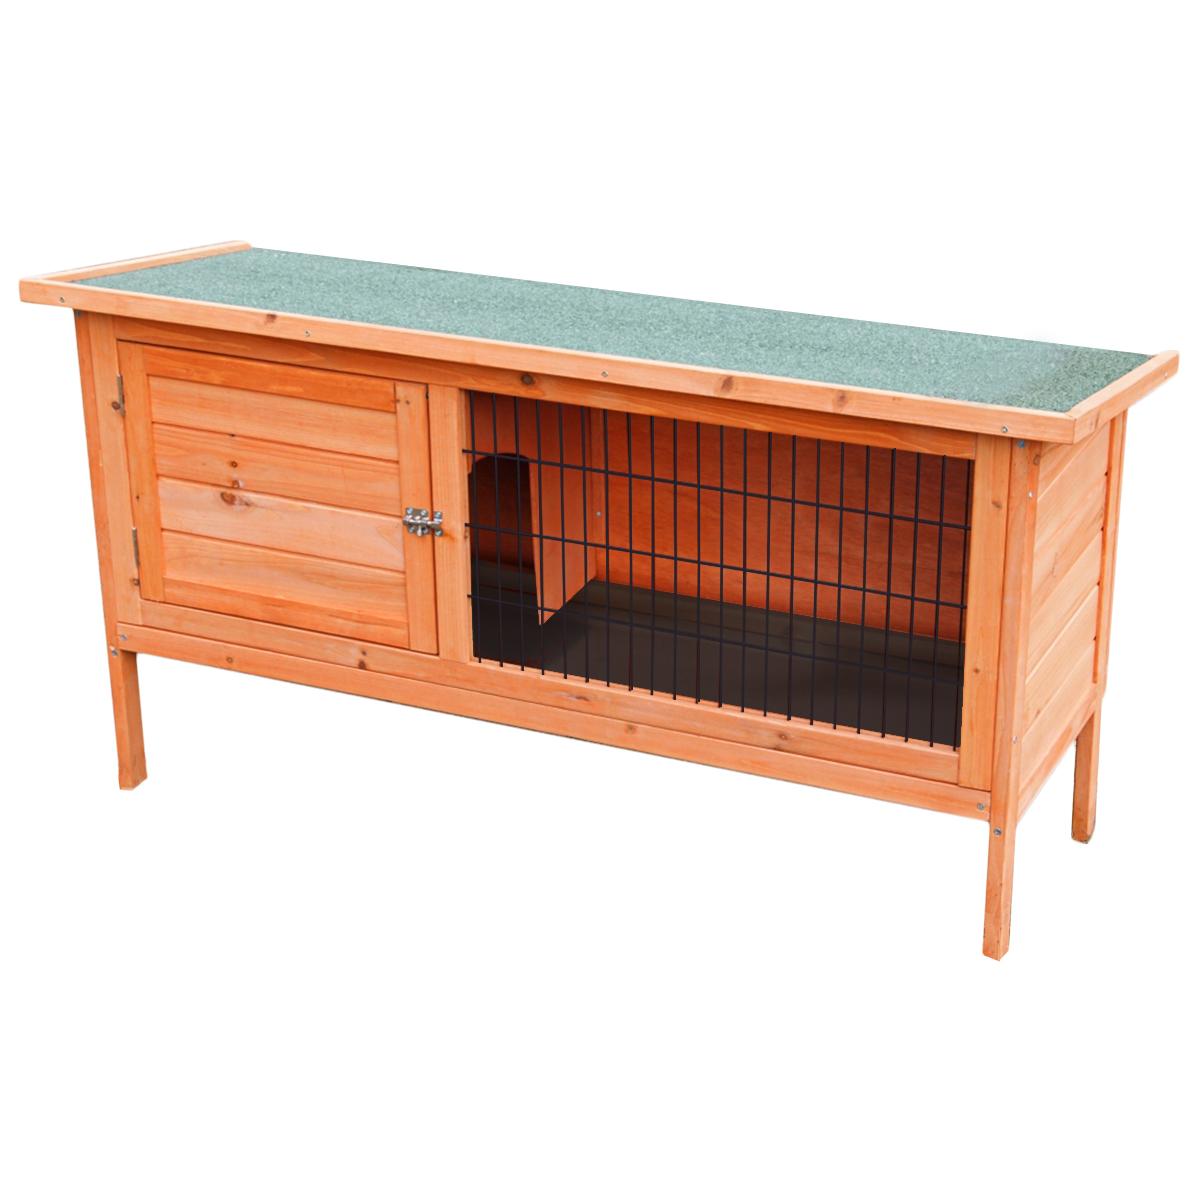 Large 4ft wooden single rabbit hutch pet indoor outdoor for Outdoor guinea pig hutch